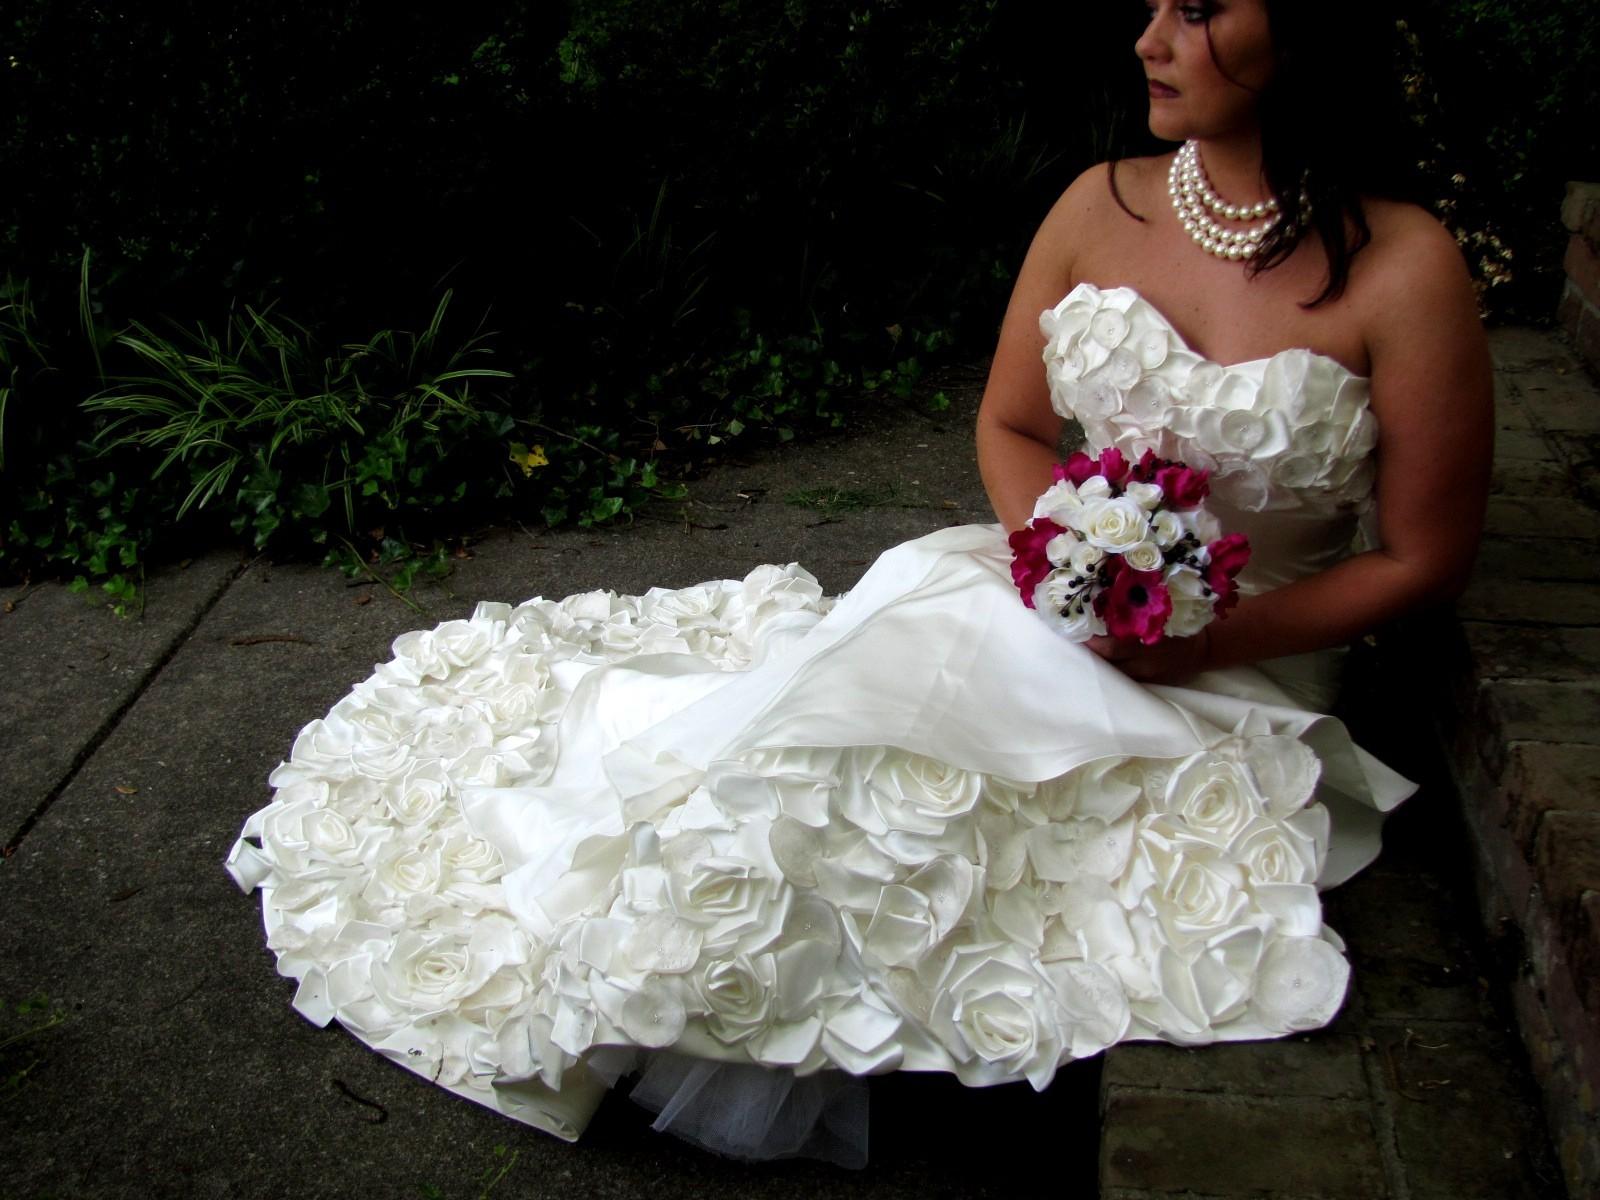 Wedding Gowns Fairy Tale Wedding Part 1 Ashlee Proffitt